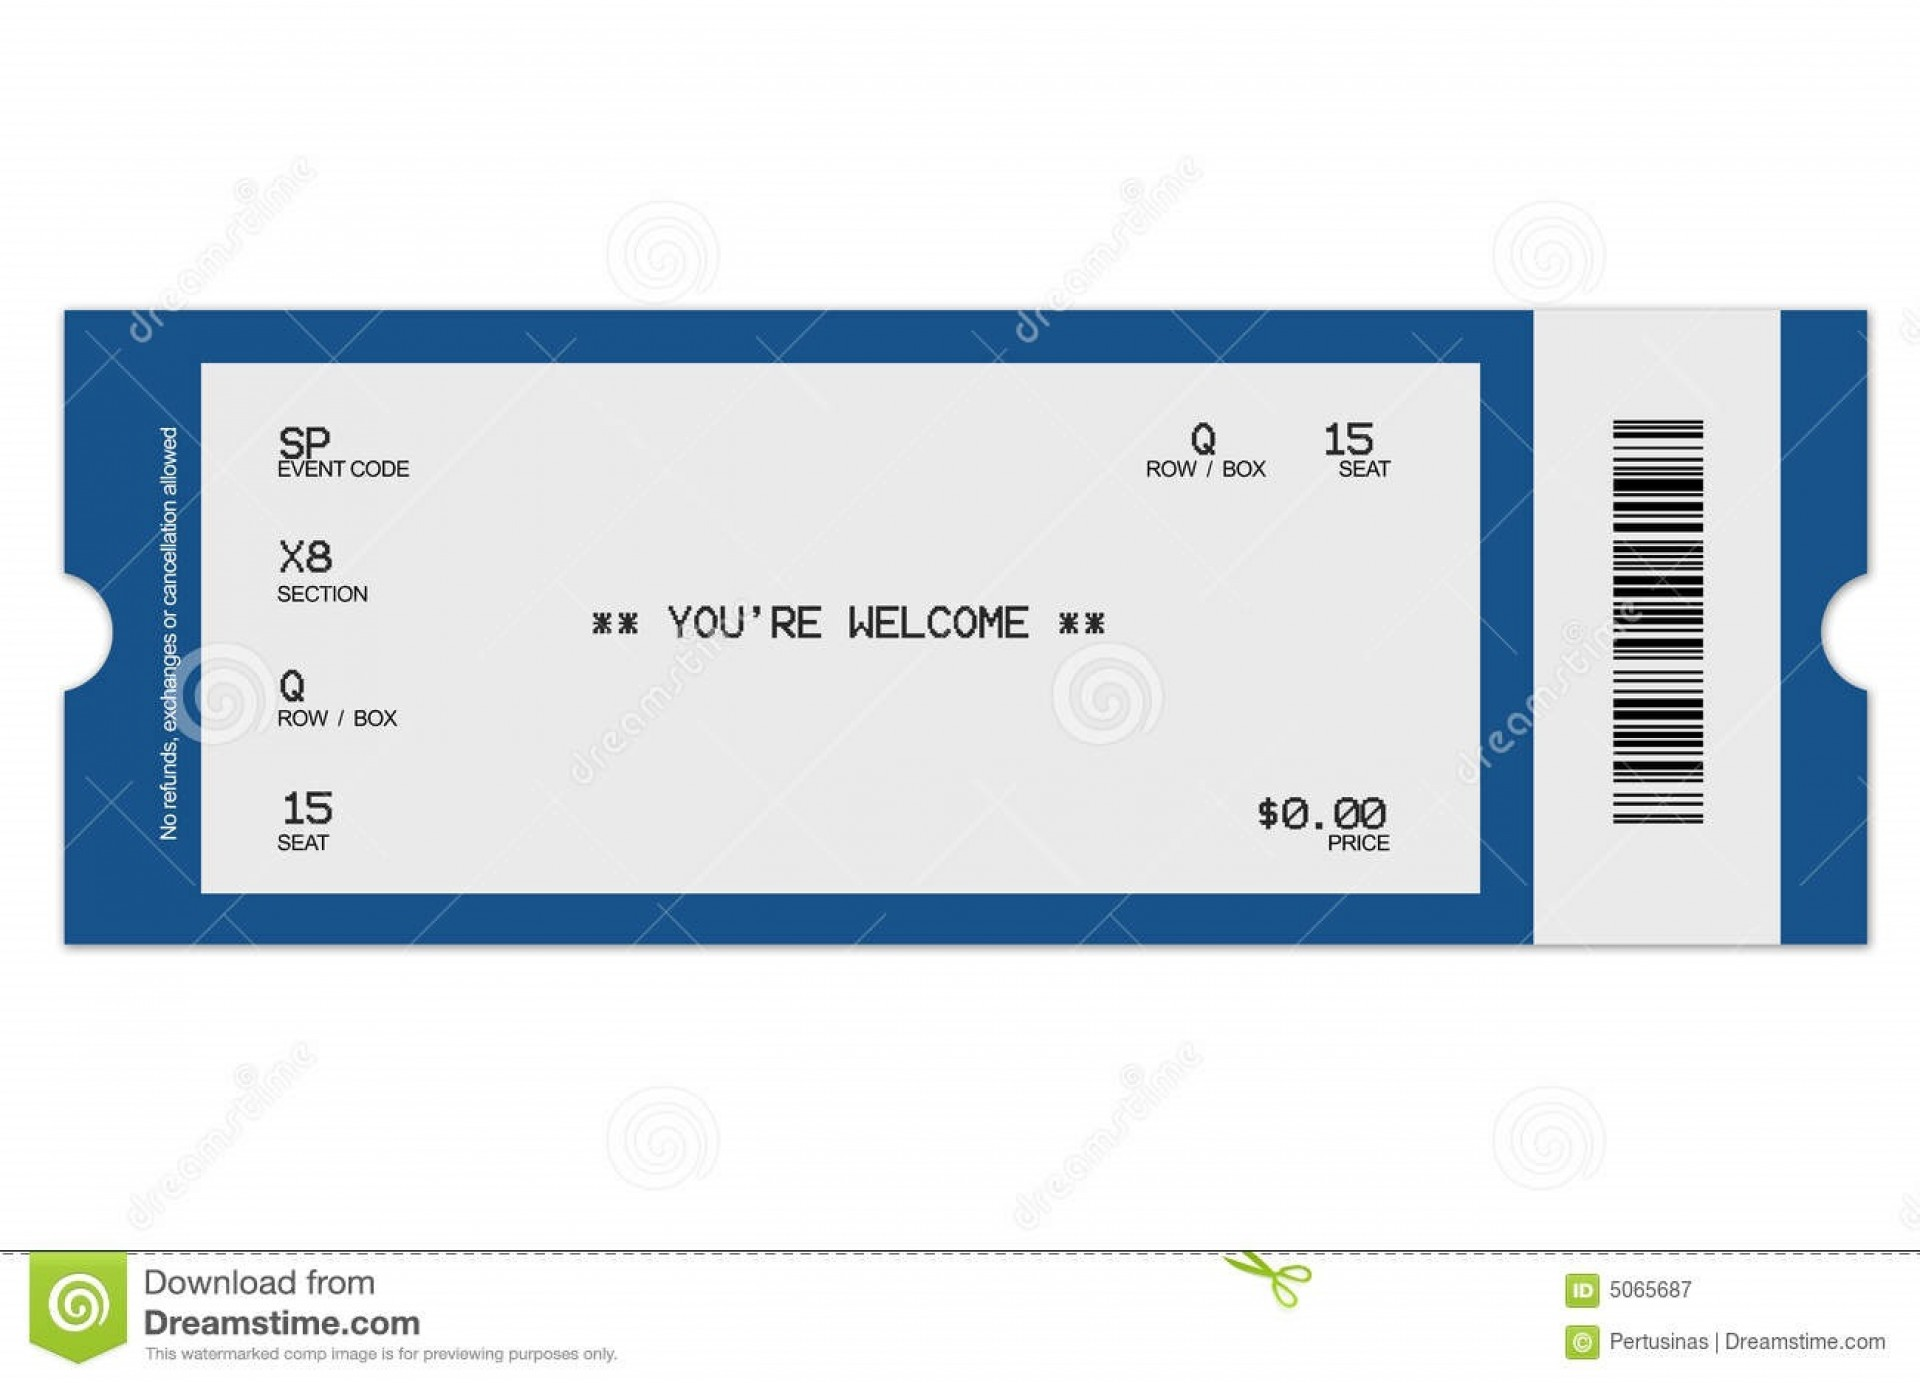 006 Sensational Free Fake Concert Ticket Template High Def 1920